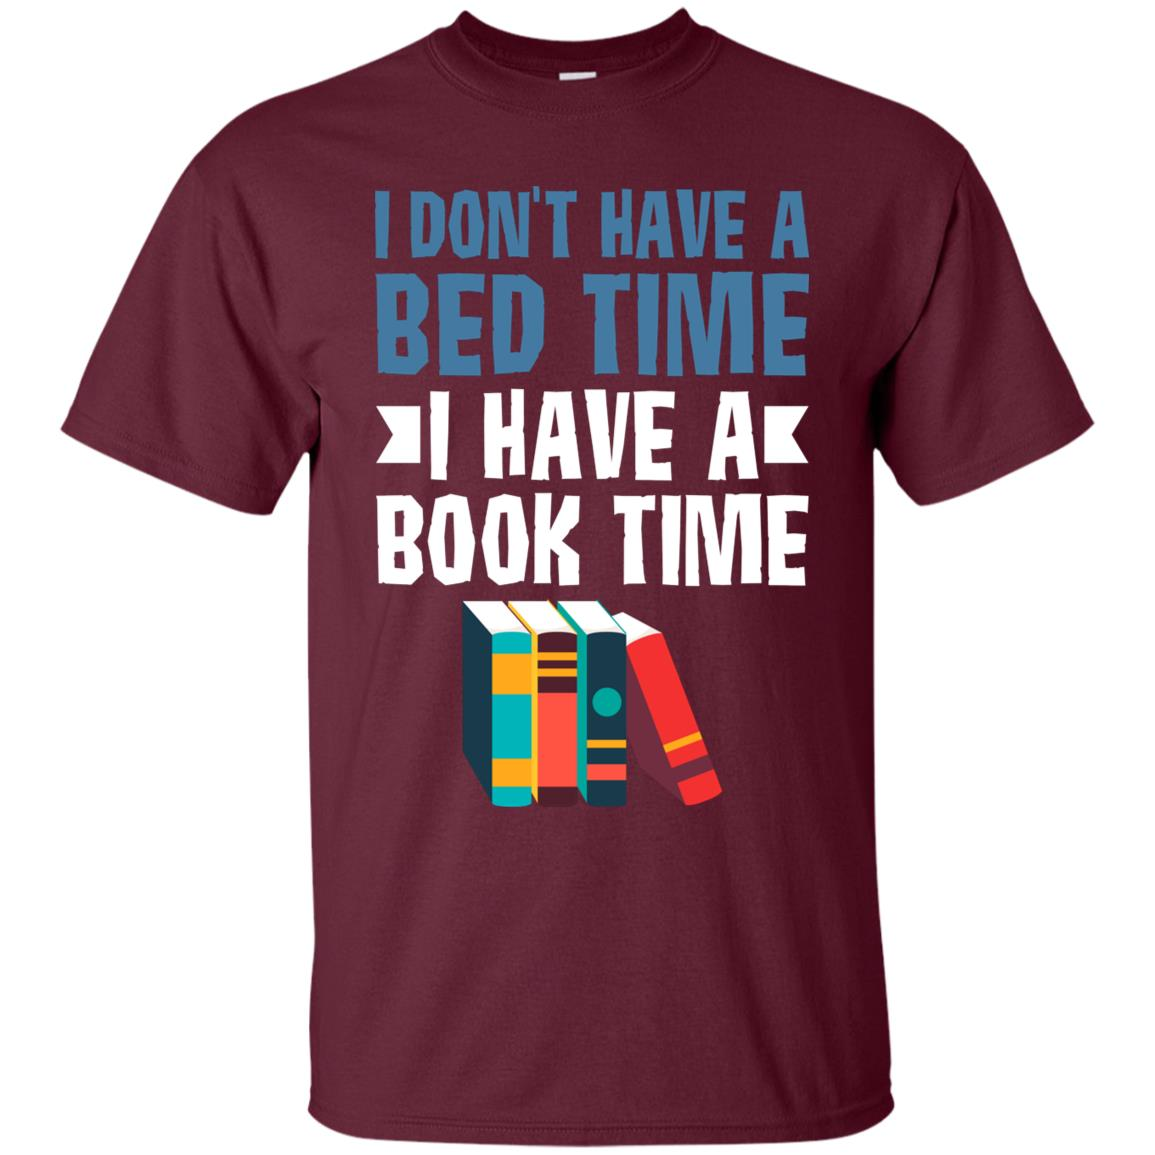 I Don't Have a Bed Time – I Have a Book Time Fun Unisex Short Sleeve